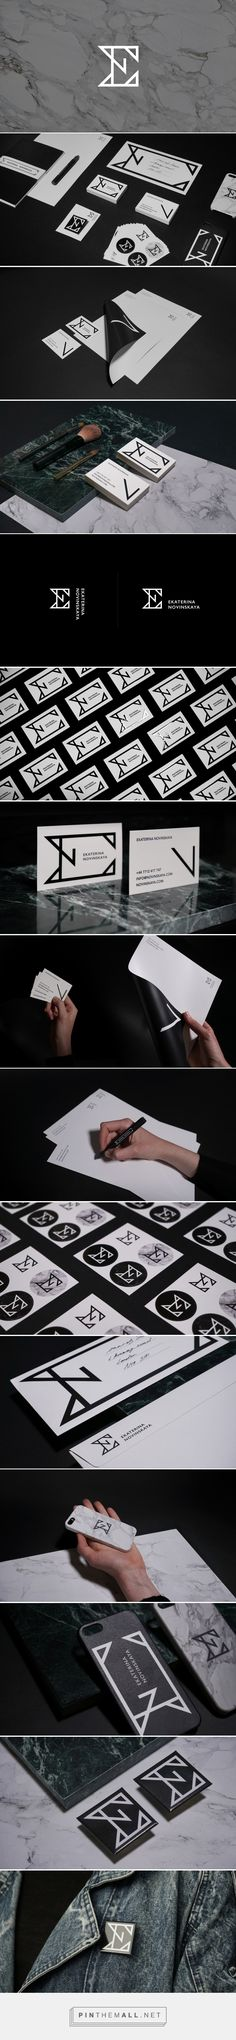 Ekaterina Novinskaya MakeUp Artist & Make Up Brand / Branding / Ideas / Inspiration / Brand Design / Logo Design / Brand Identity / Monogram / Minimalist / Minimal / Black / White / Grey / Initials / Elegant /Modern / Aggressive / Imposing / Powerful / Geometrical /